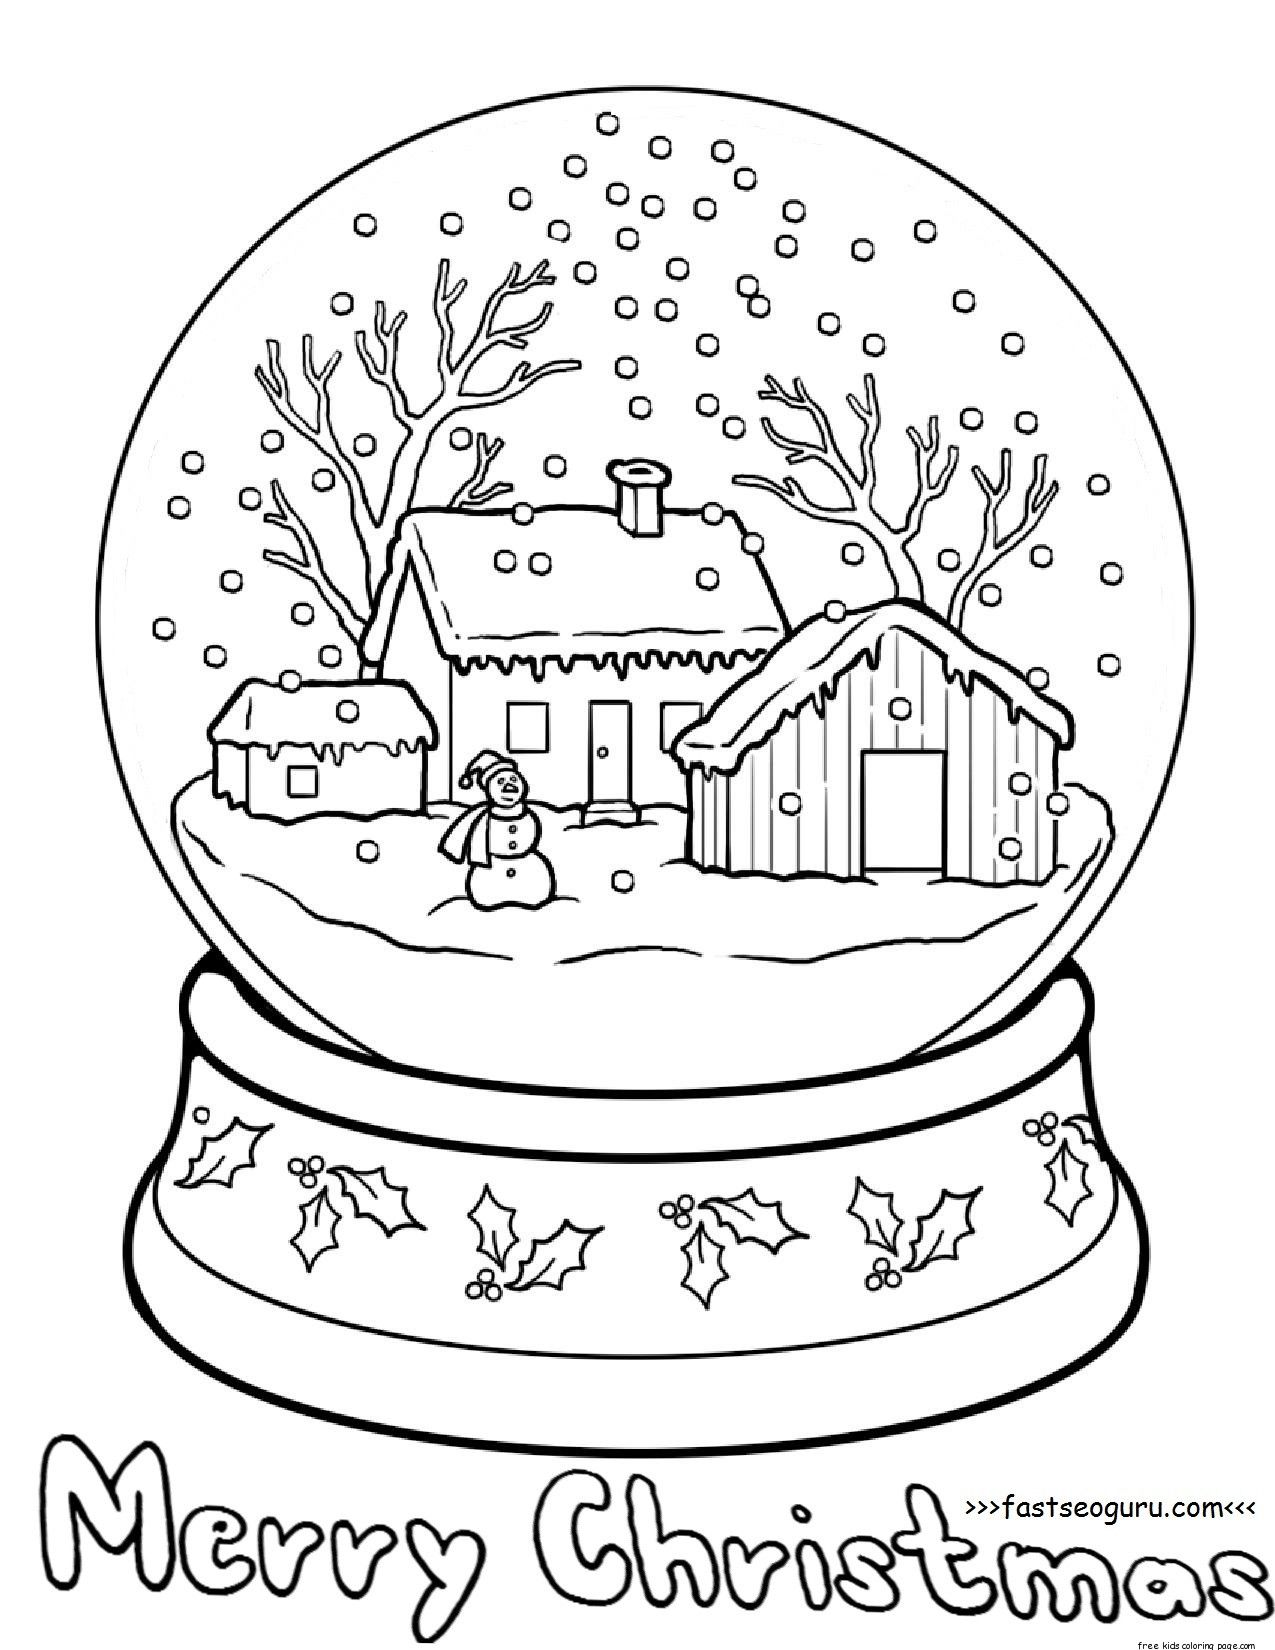 globe coloring page - cmscorpion | Mandalas | Pinterest | Navidad ...